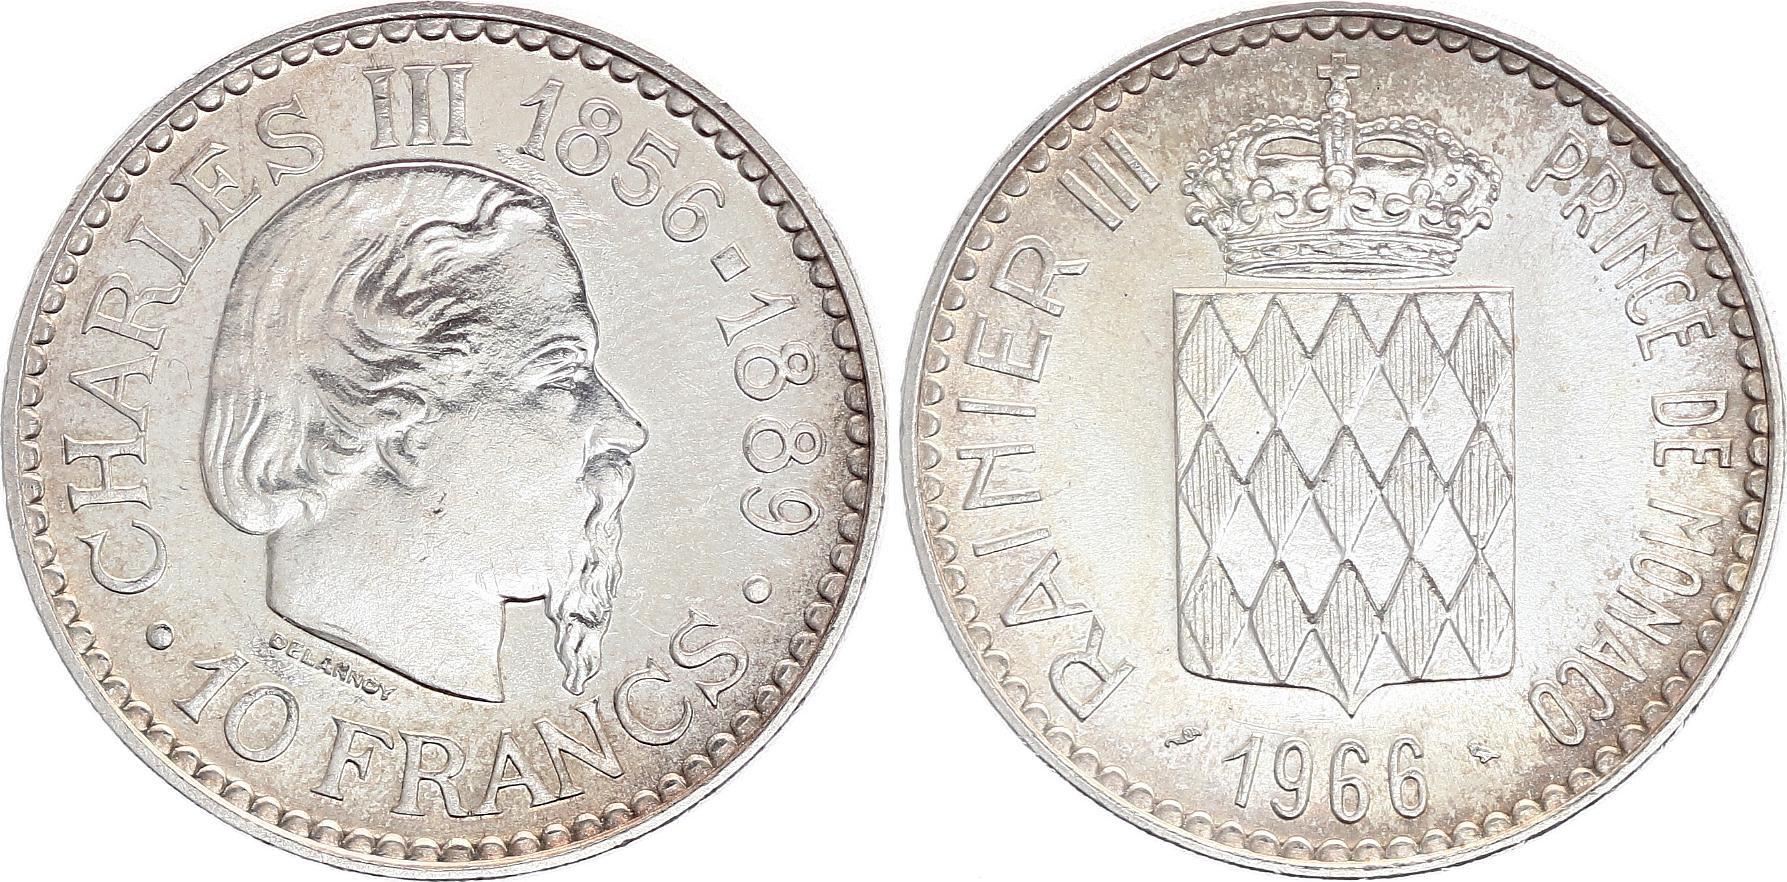 Monaco 10 Francs Charles III  - 1966 - SUP - Argent